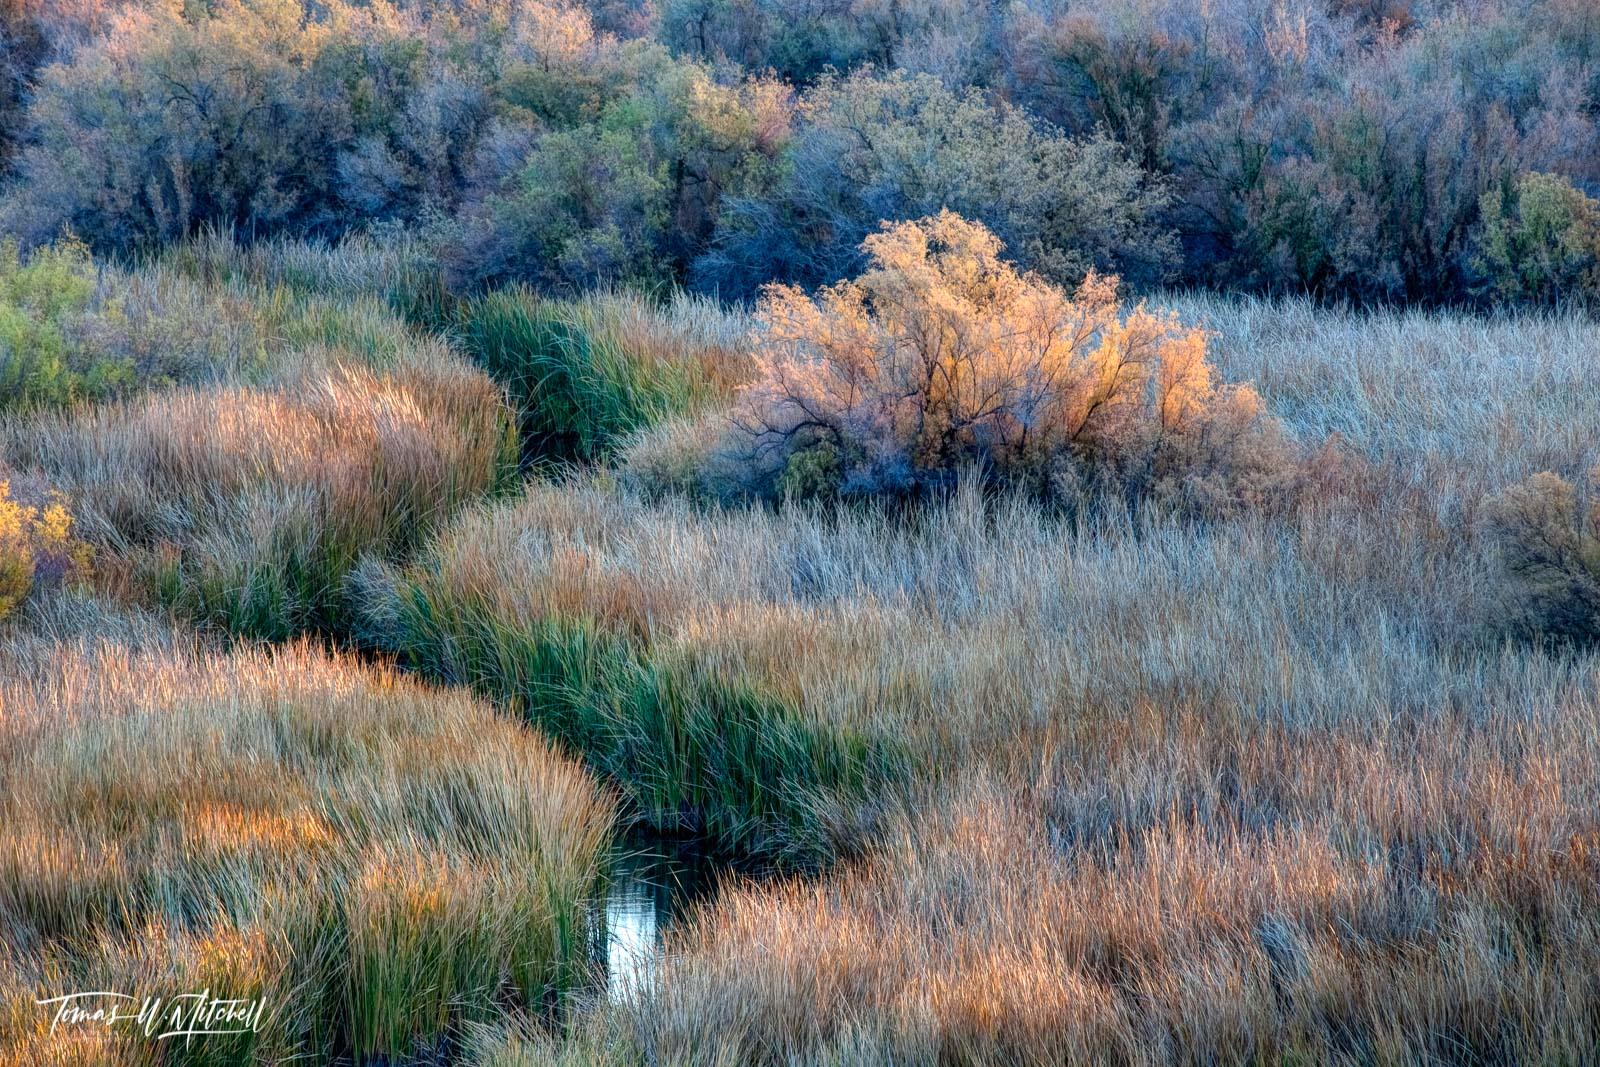 limited edition, fine art, prints, bill williams river, arizona, water, fall, lake havasu, sunrise, grass, bushes, yellow, green, blue, curving, photo